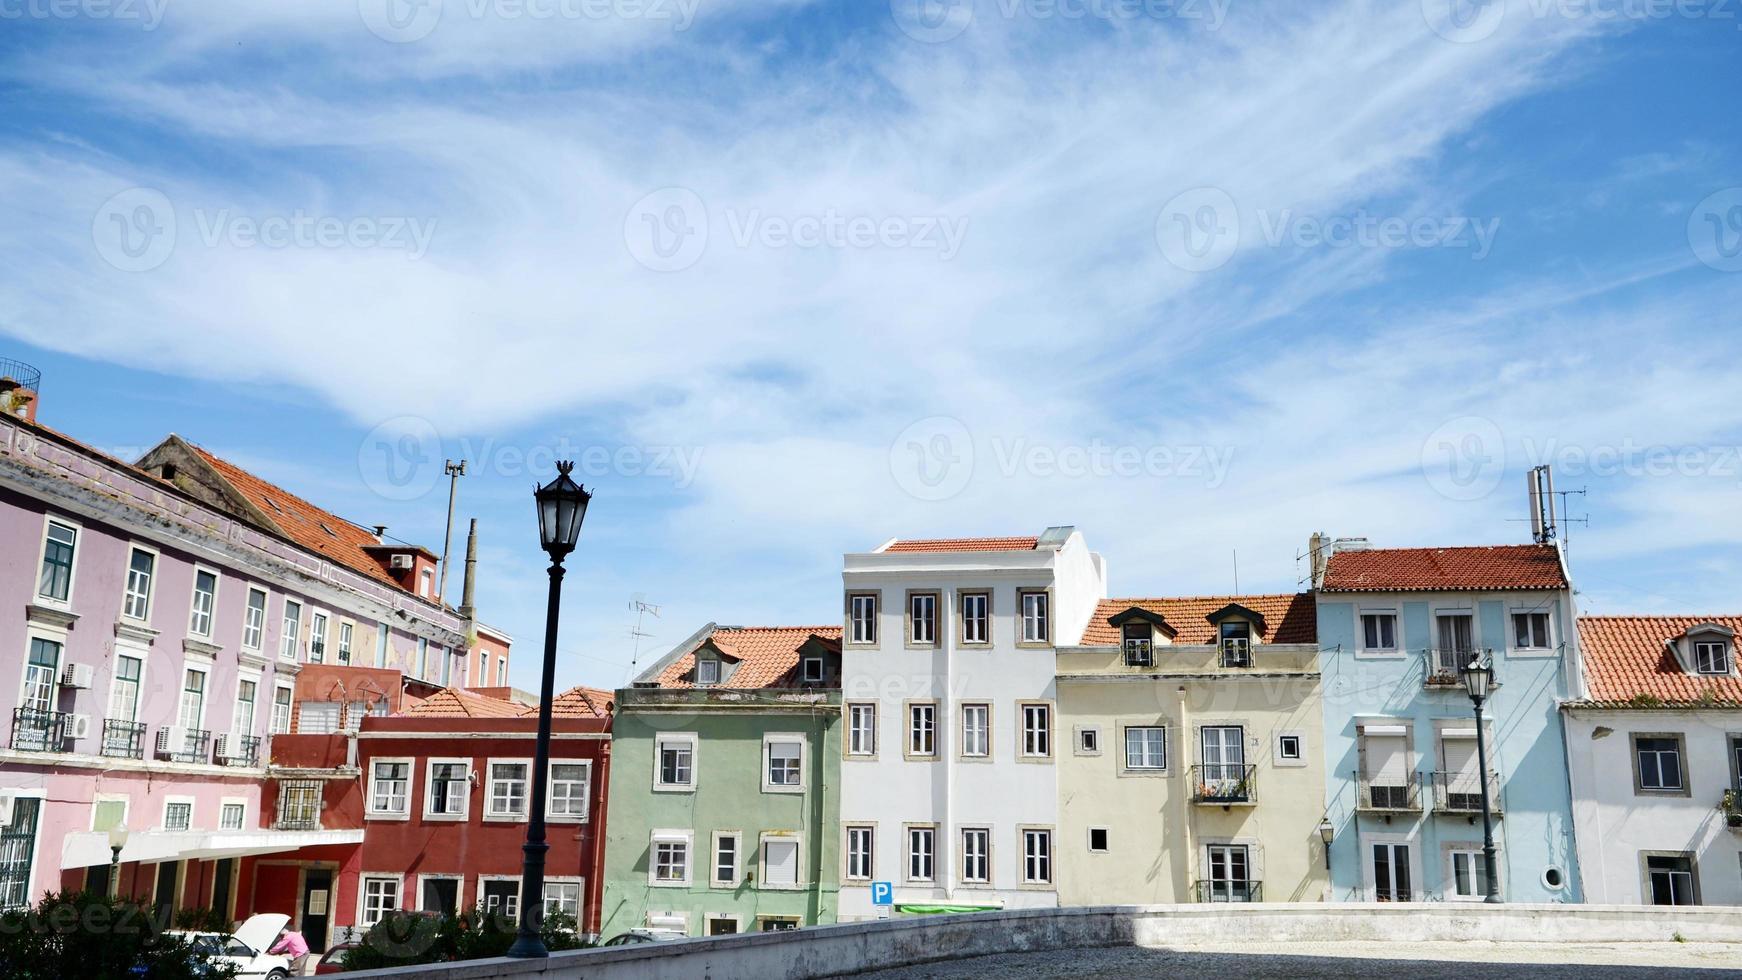 casa de tijolos coloridos em lisboa, portugal. foto